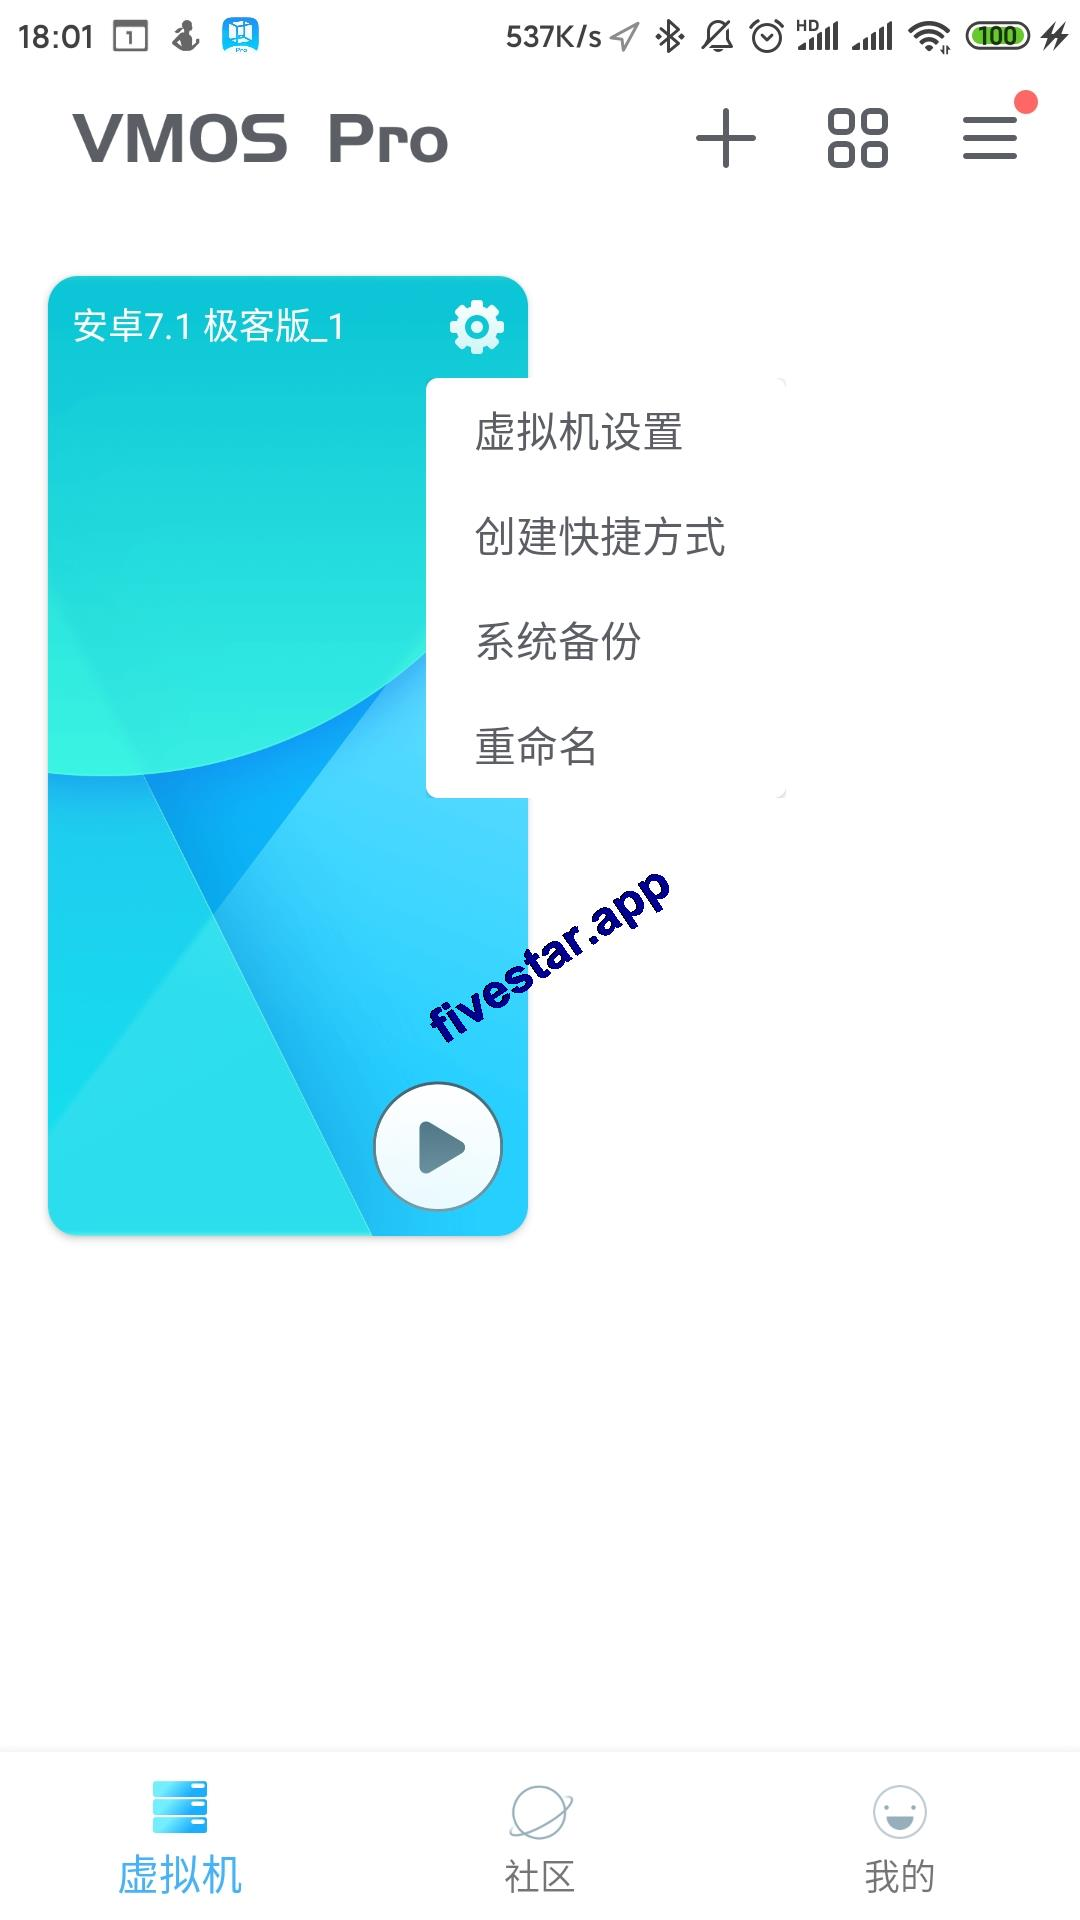 VMOS pro 虚拟大师专业版